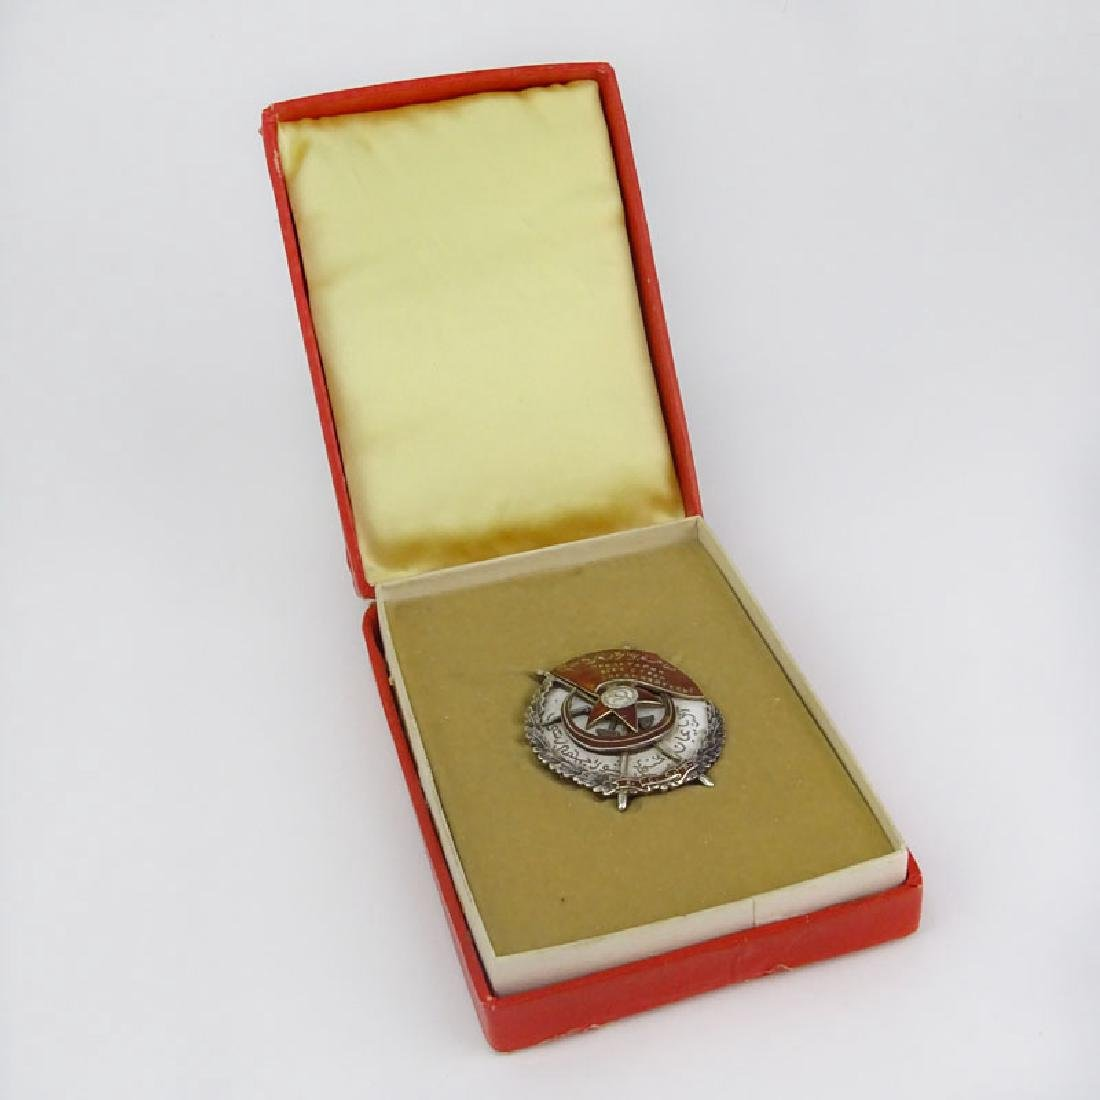 Russian / Muslim 84 Silver and Enamel Badge / Medal - 2